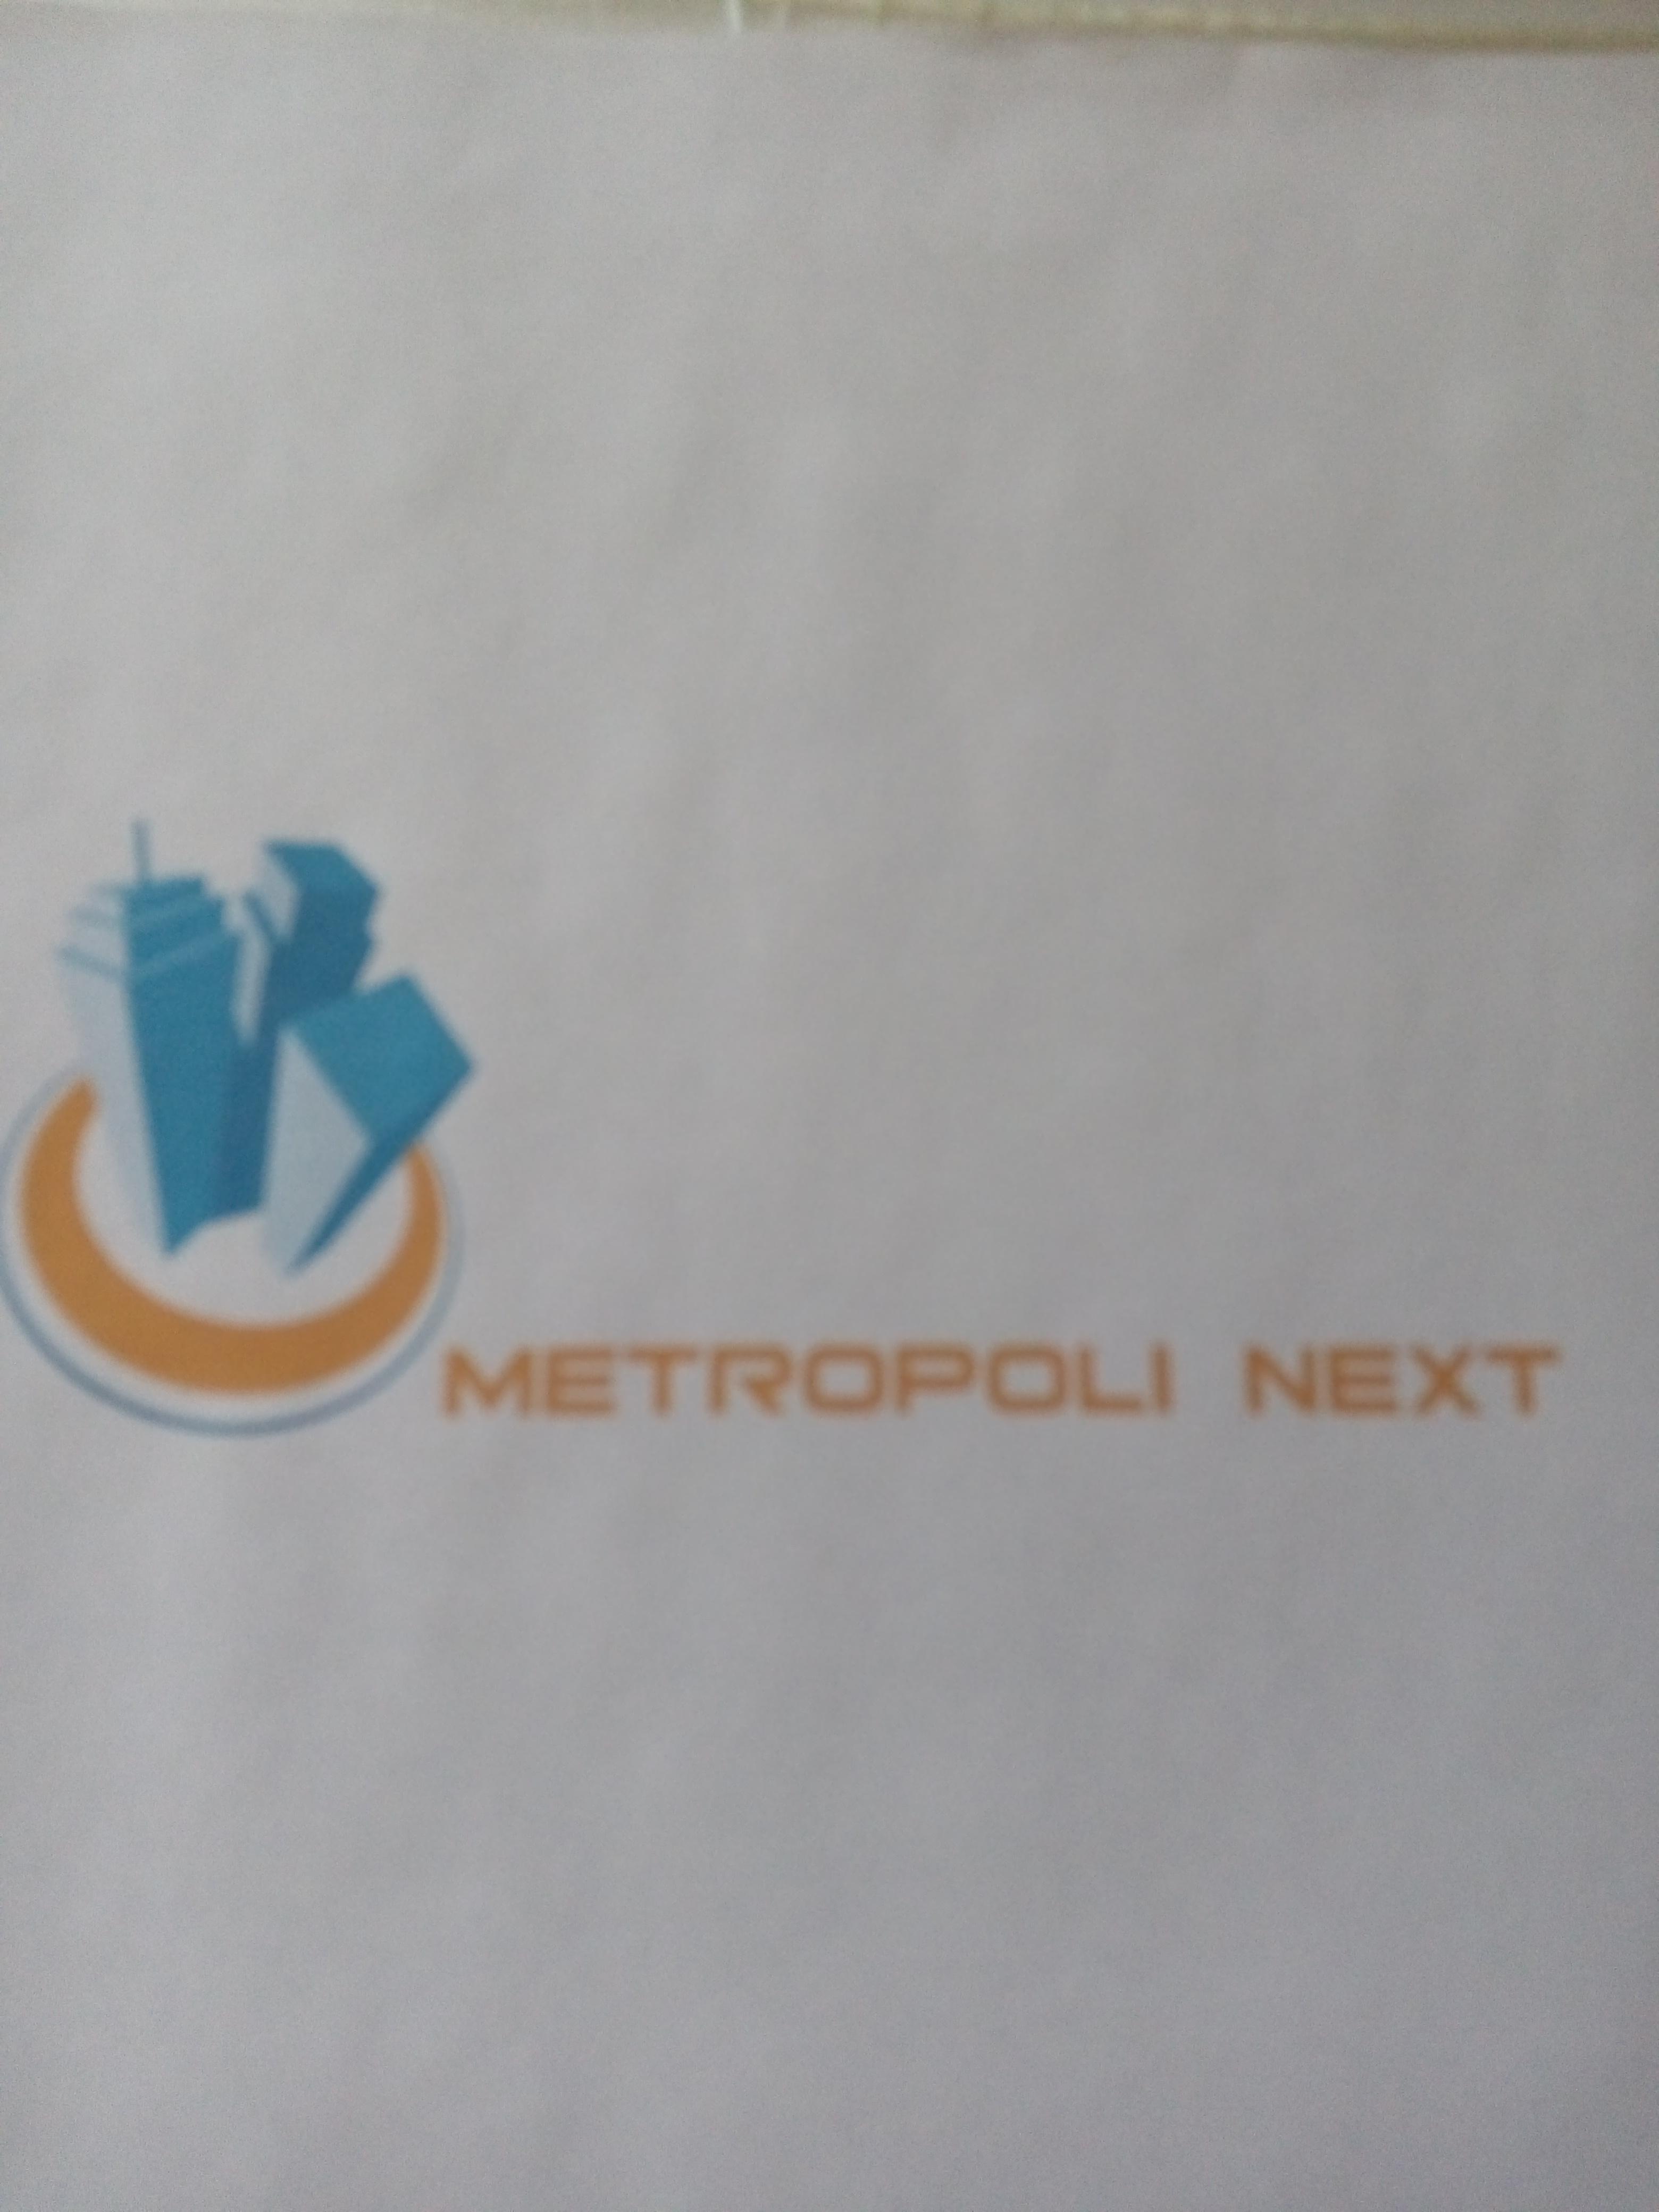 Metropolinext